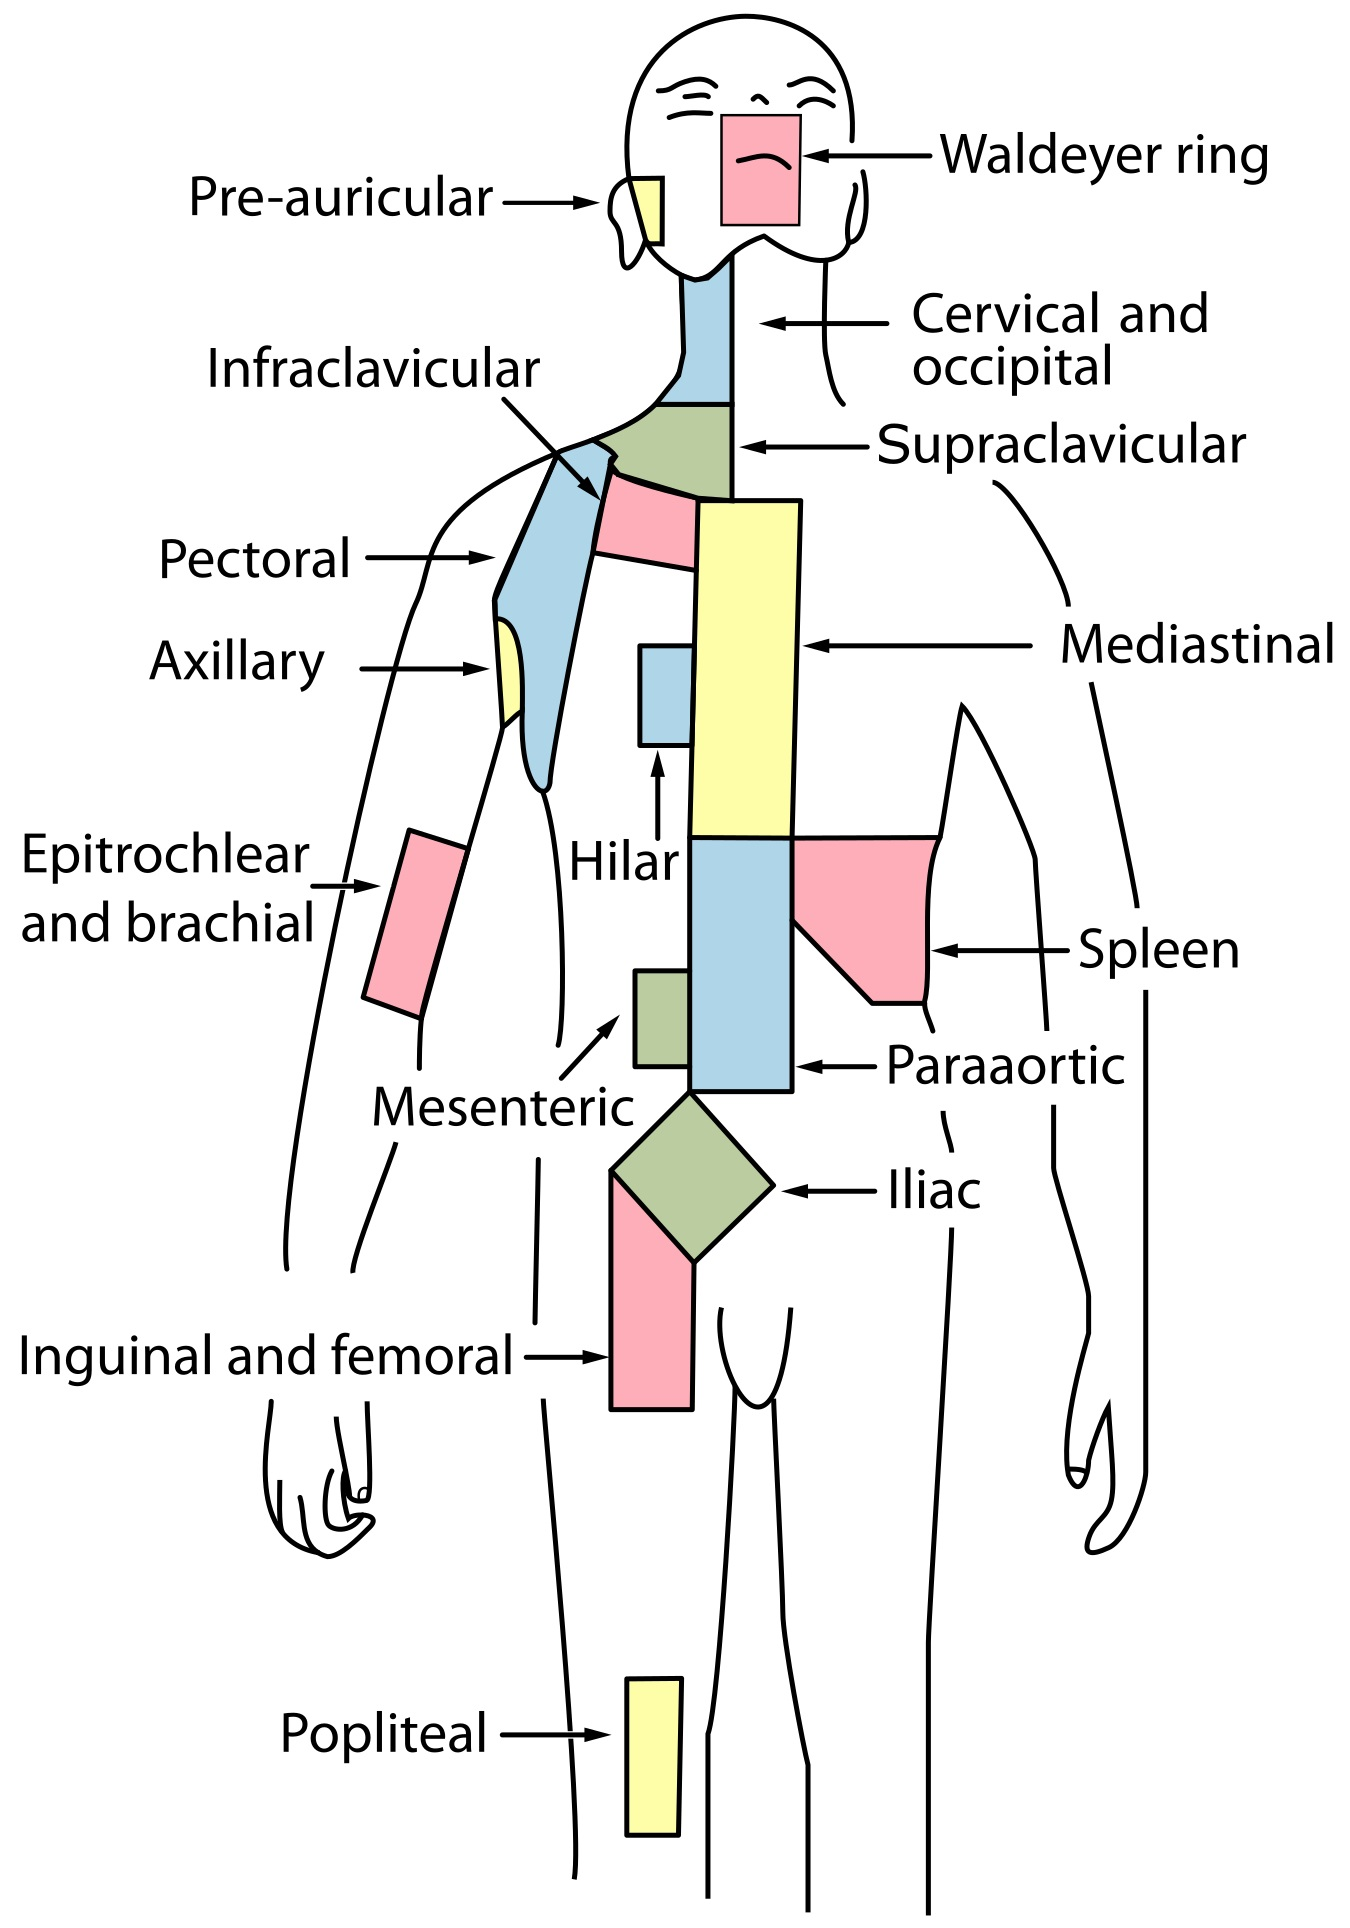 radiation oncology/hodgkin/staging - wikibooks, open books for an, Cephalic vein